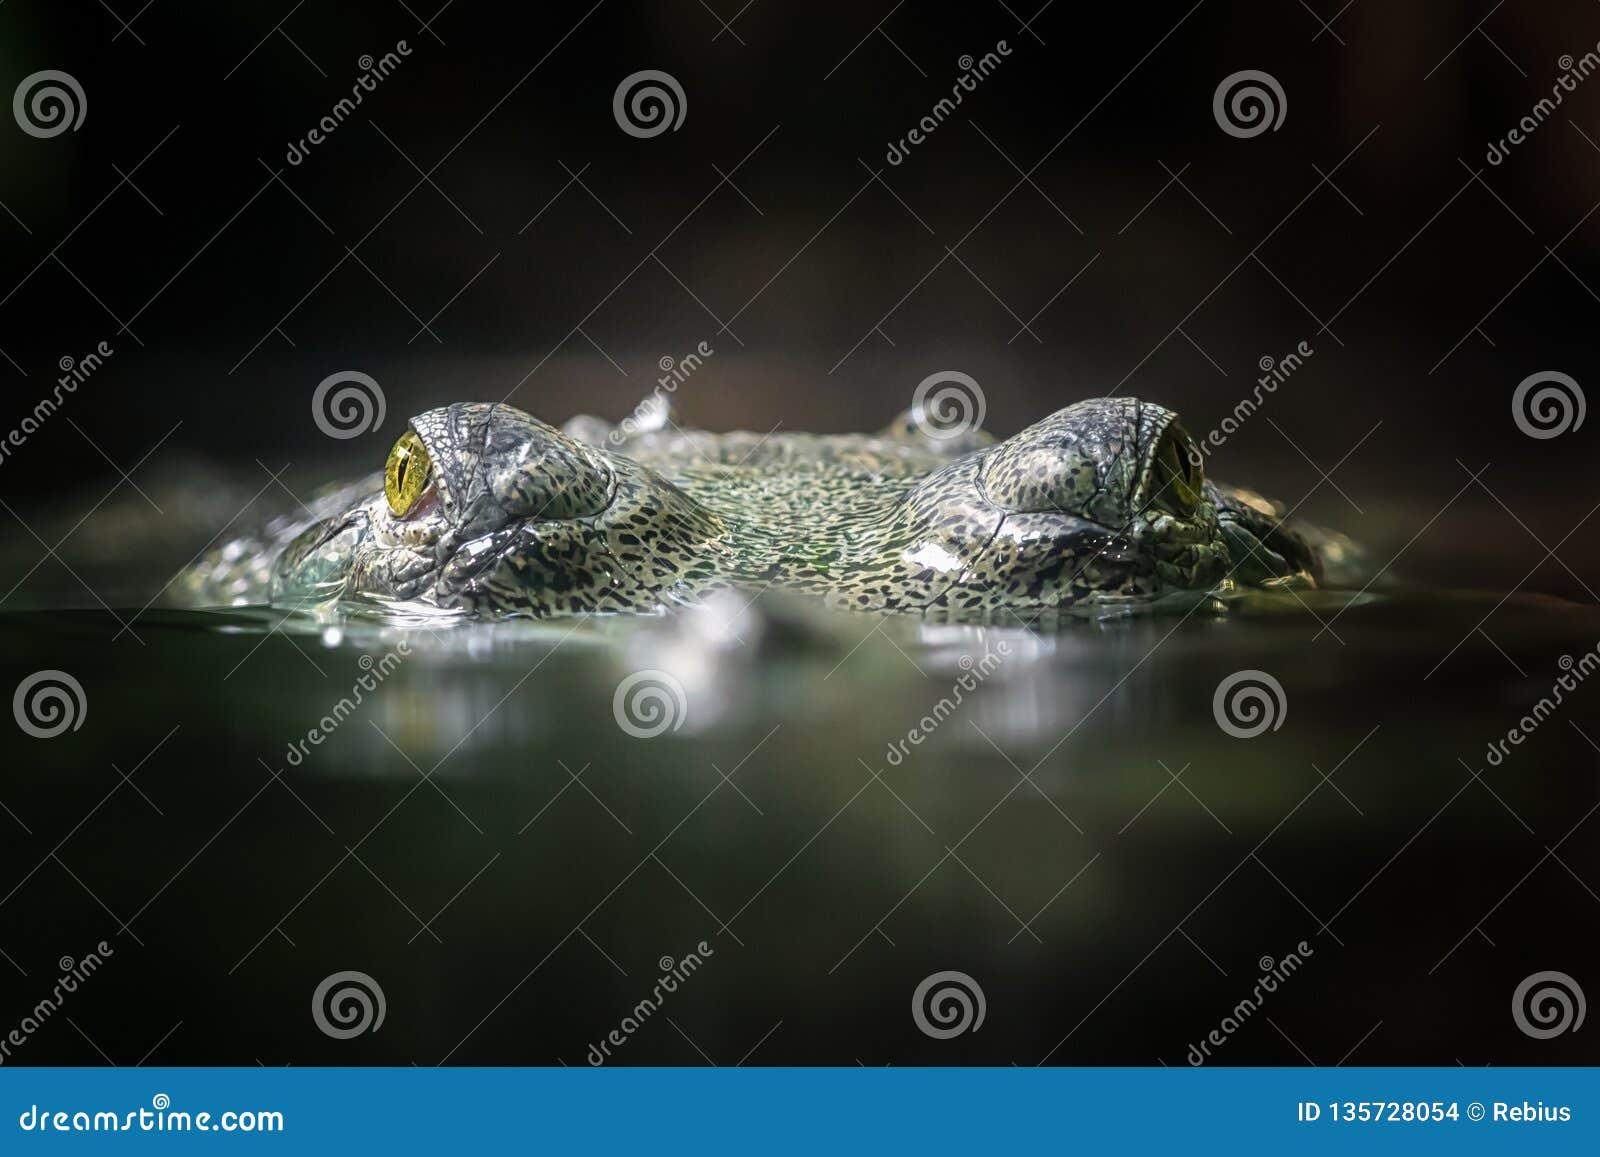 Indian gavial